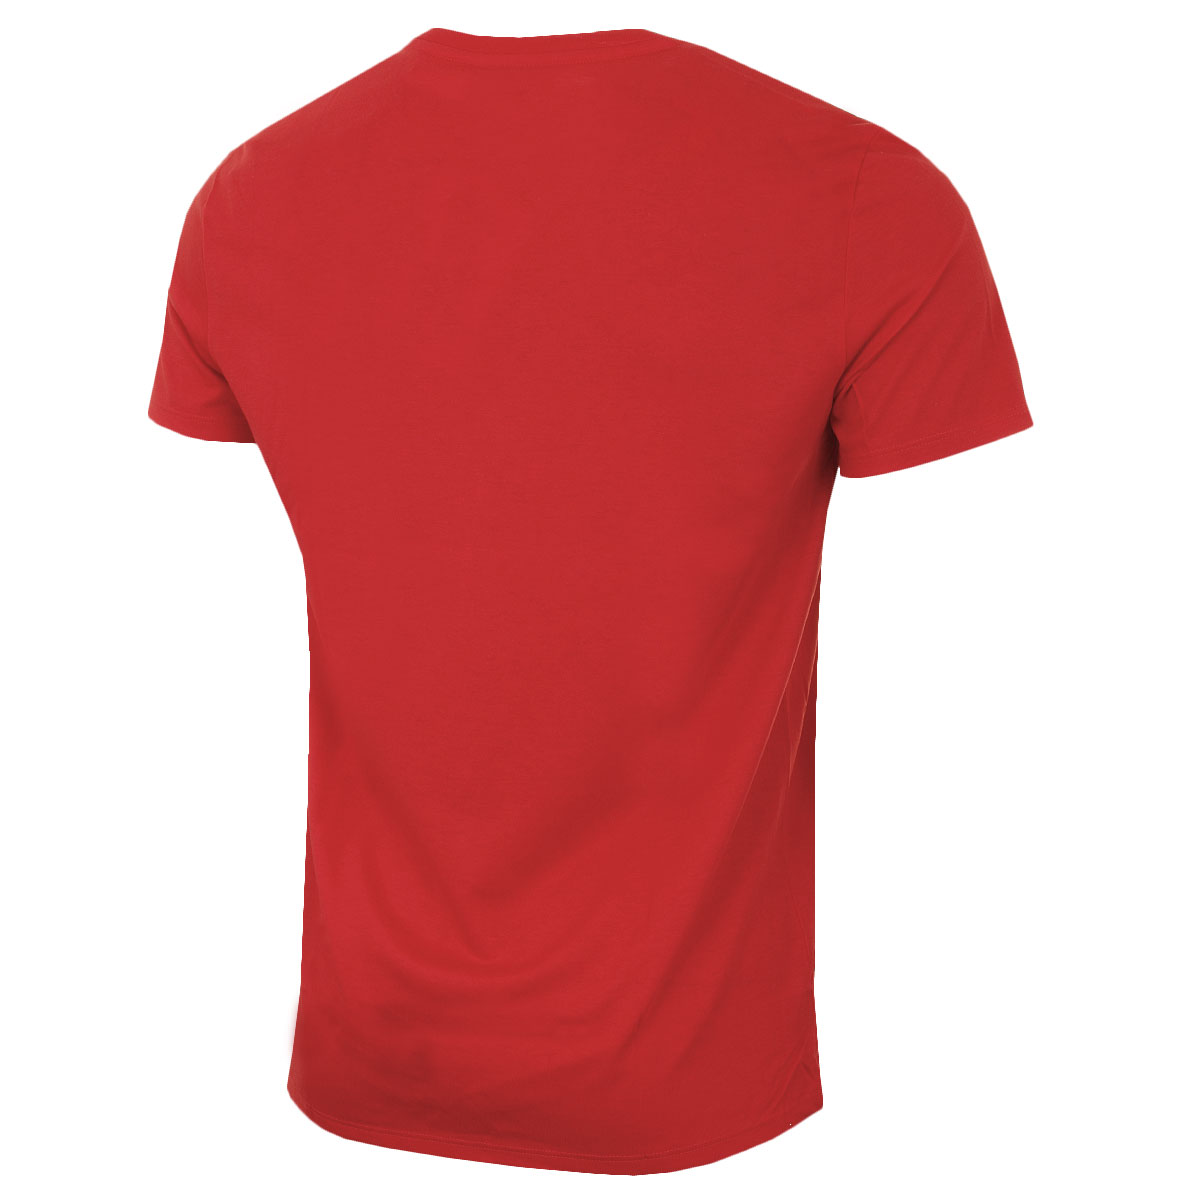 Find Great Online Logo Tech T-shirt in Red - 240 Lacoste Sport Clearance Supply c9L3LQkk